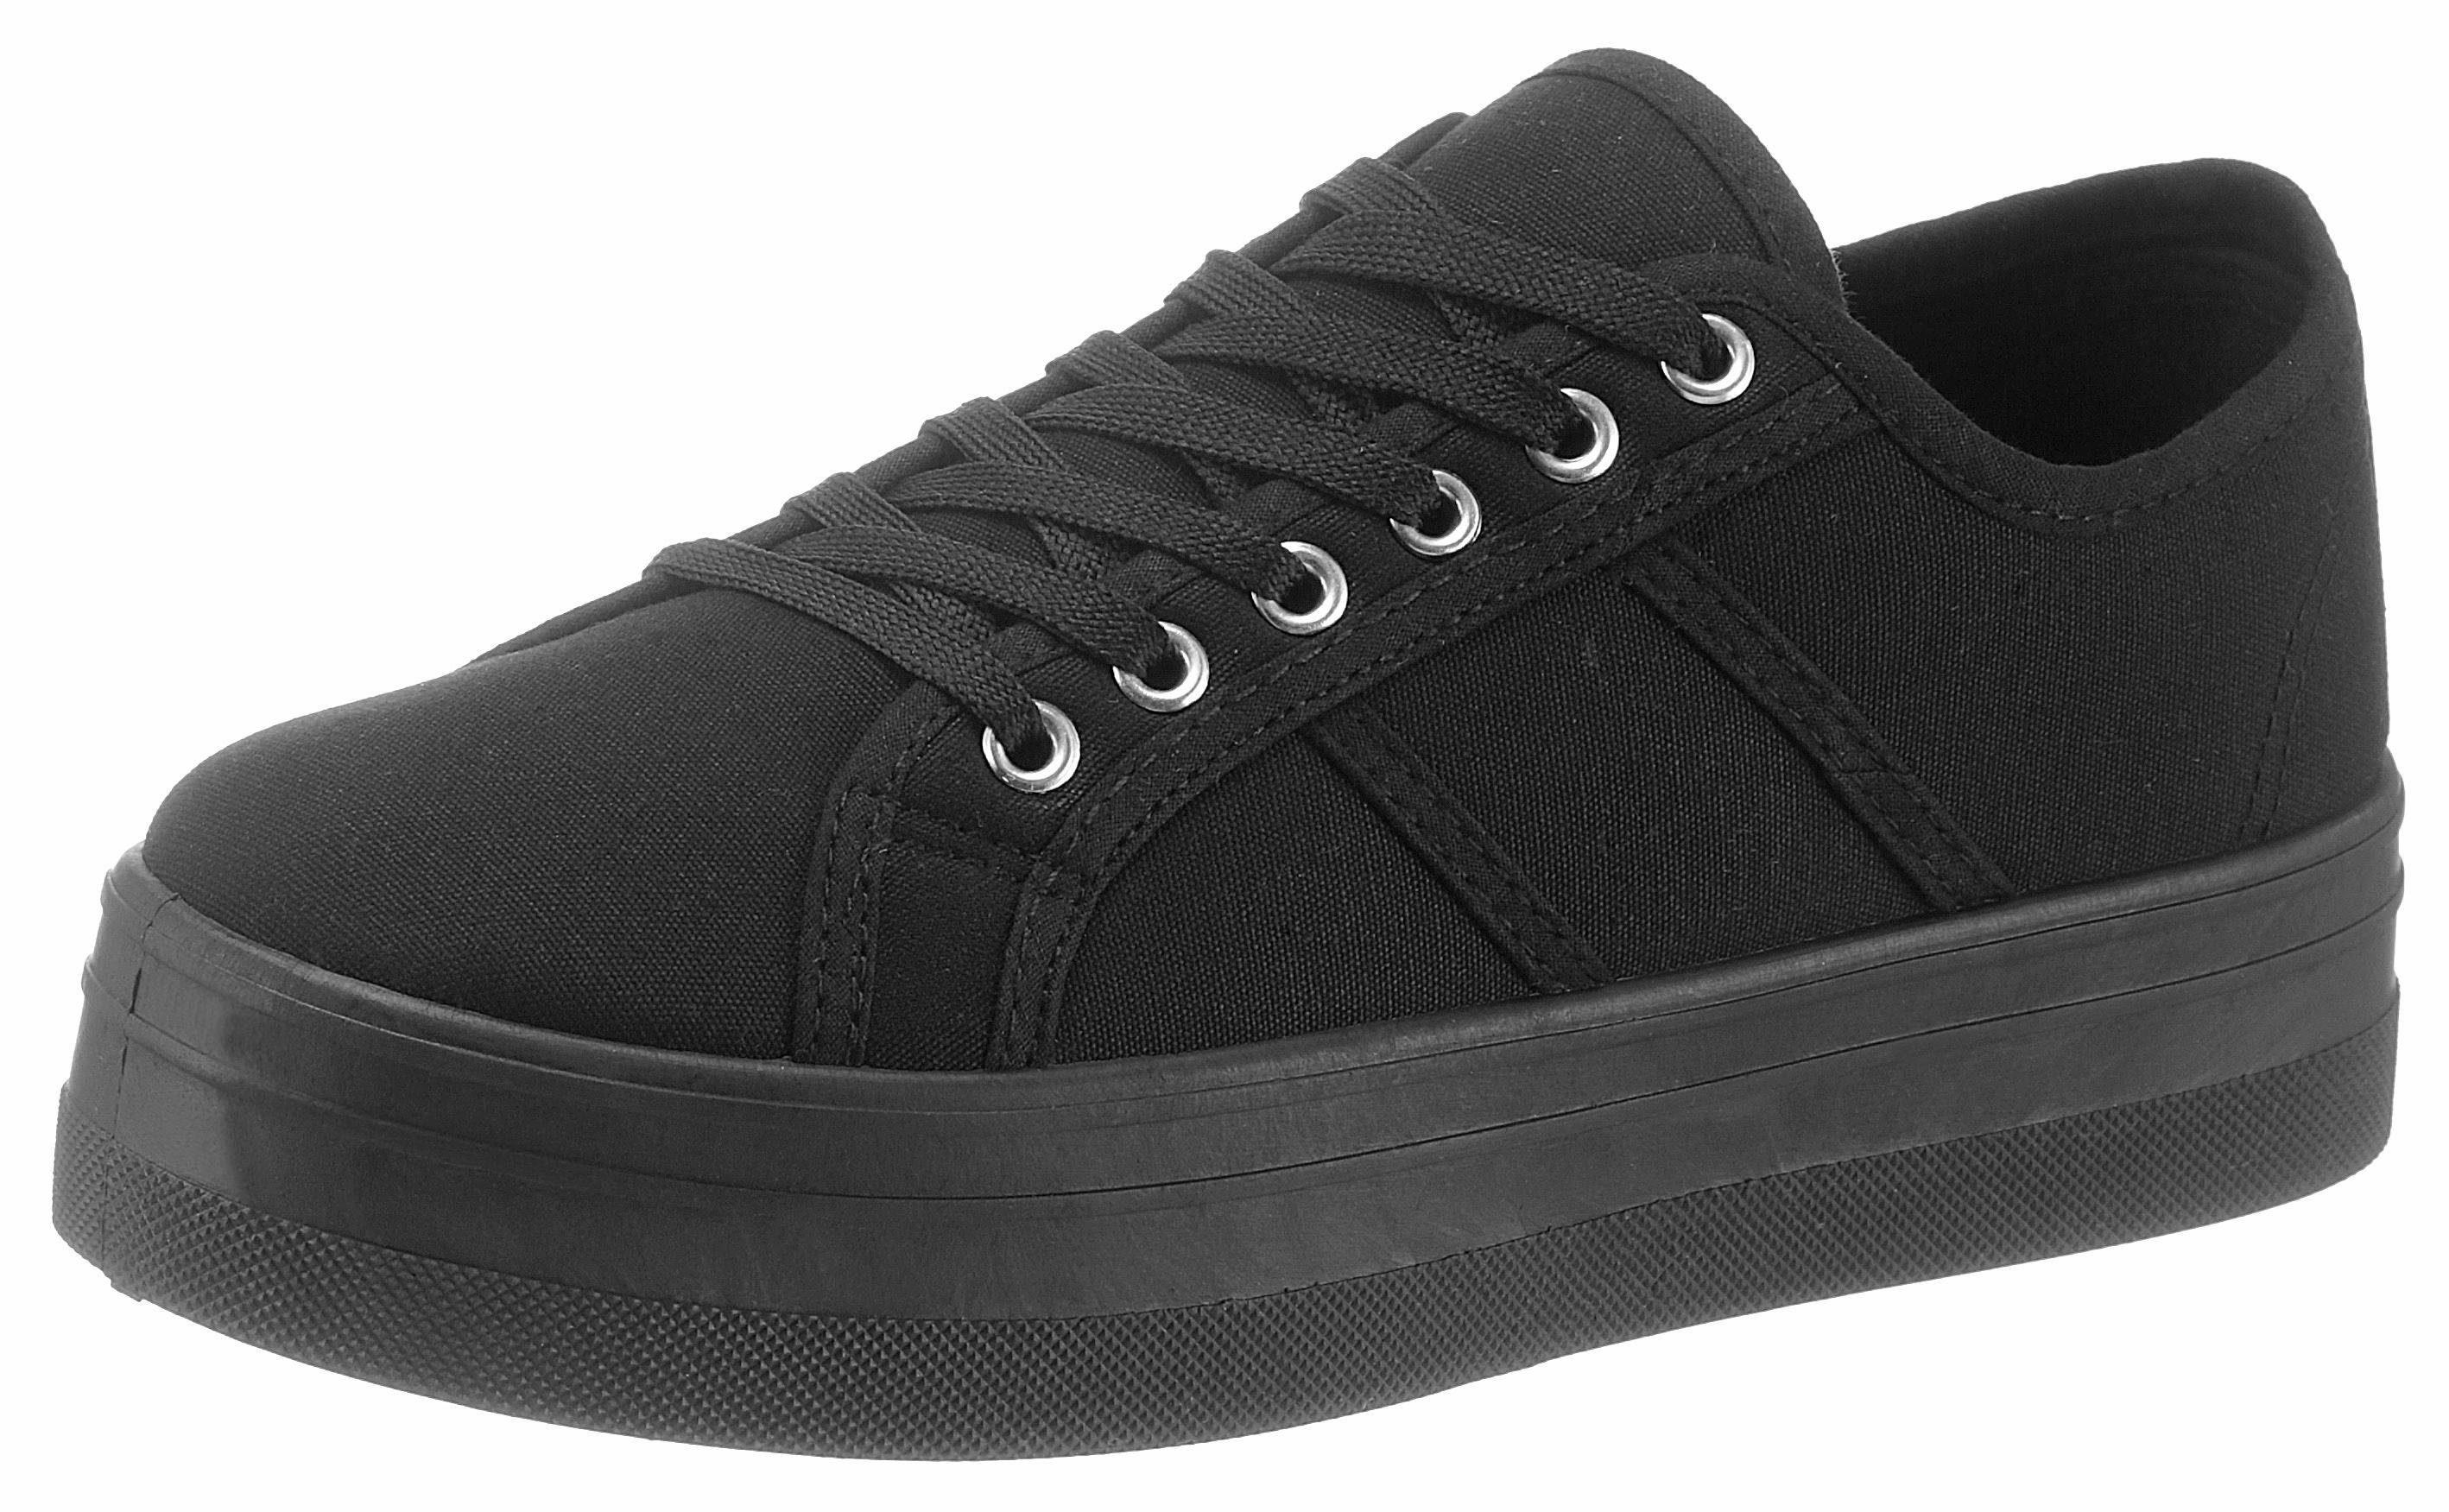 HaILYS »Pina« Sneaker, im Basic-Look, rosa, lachs